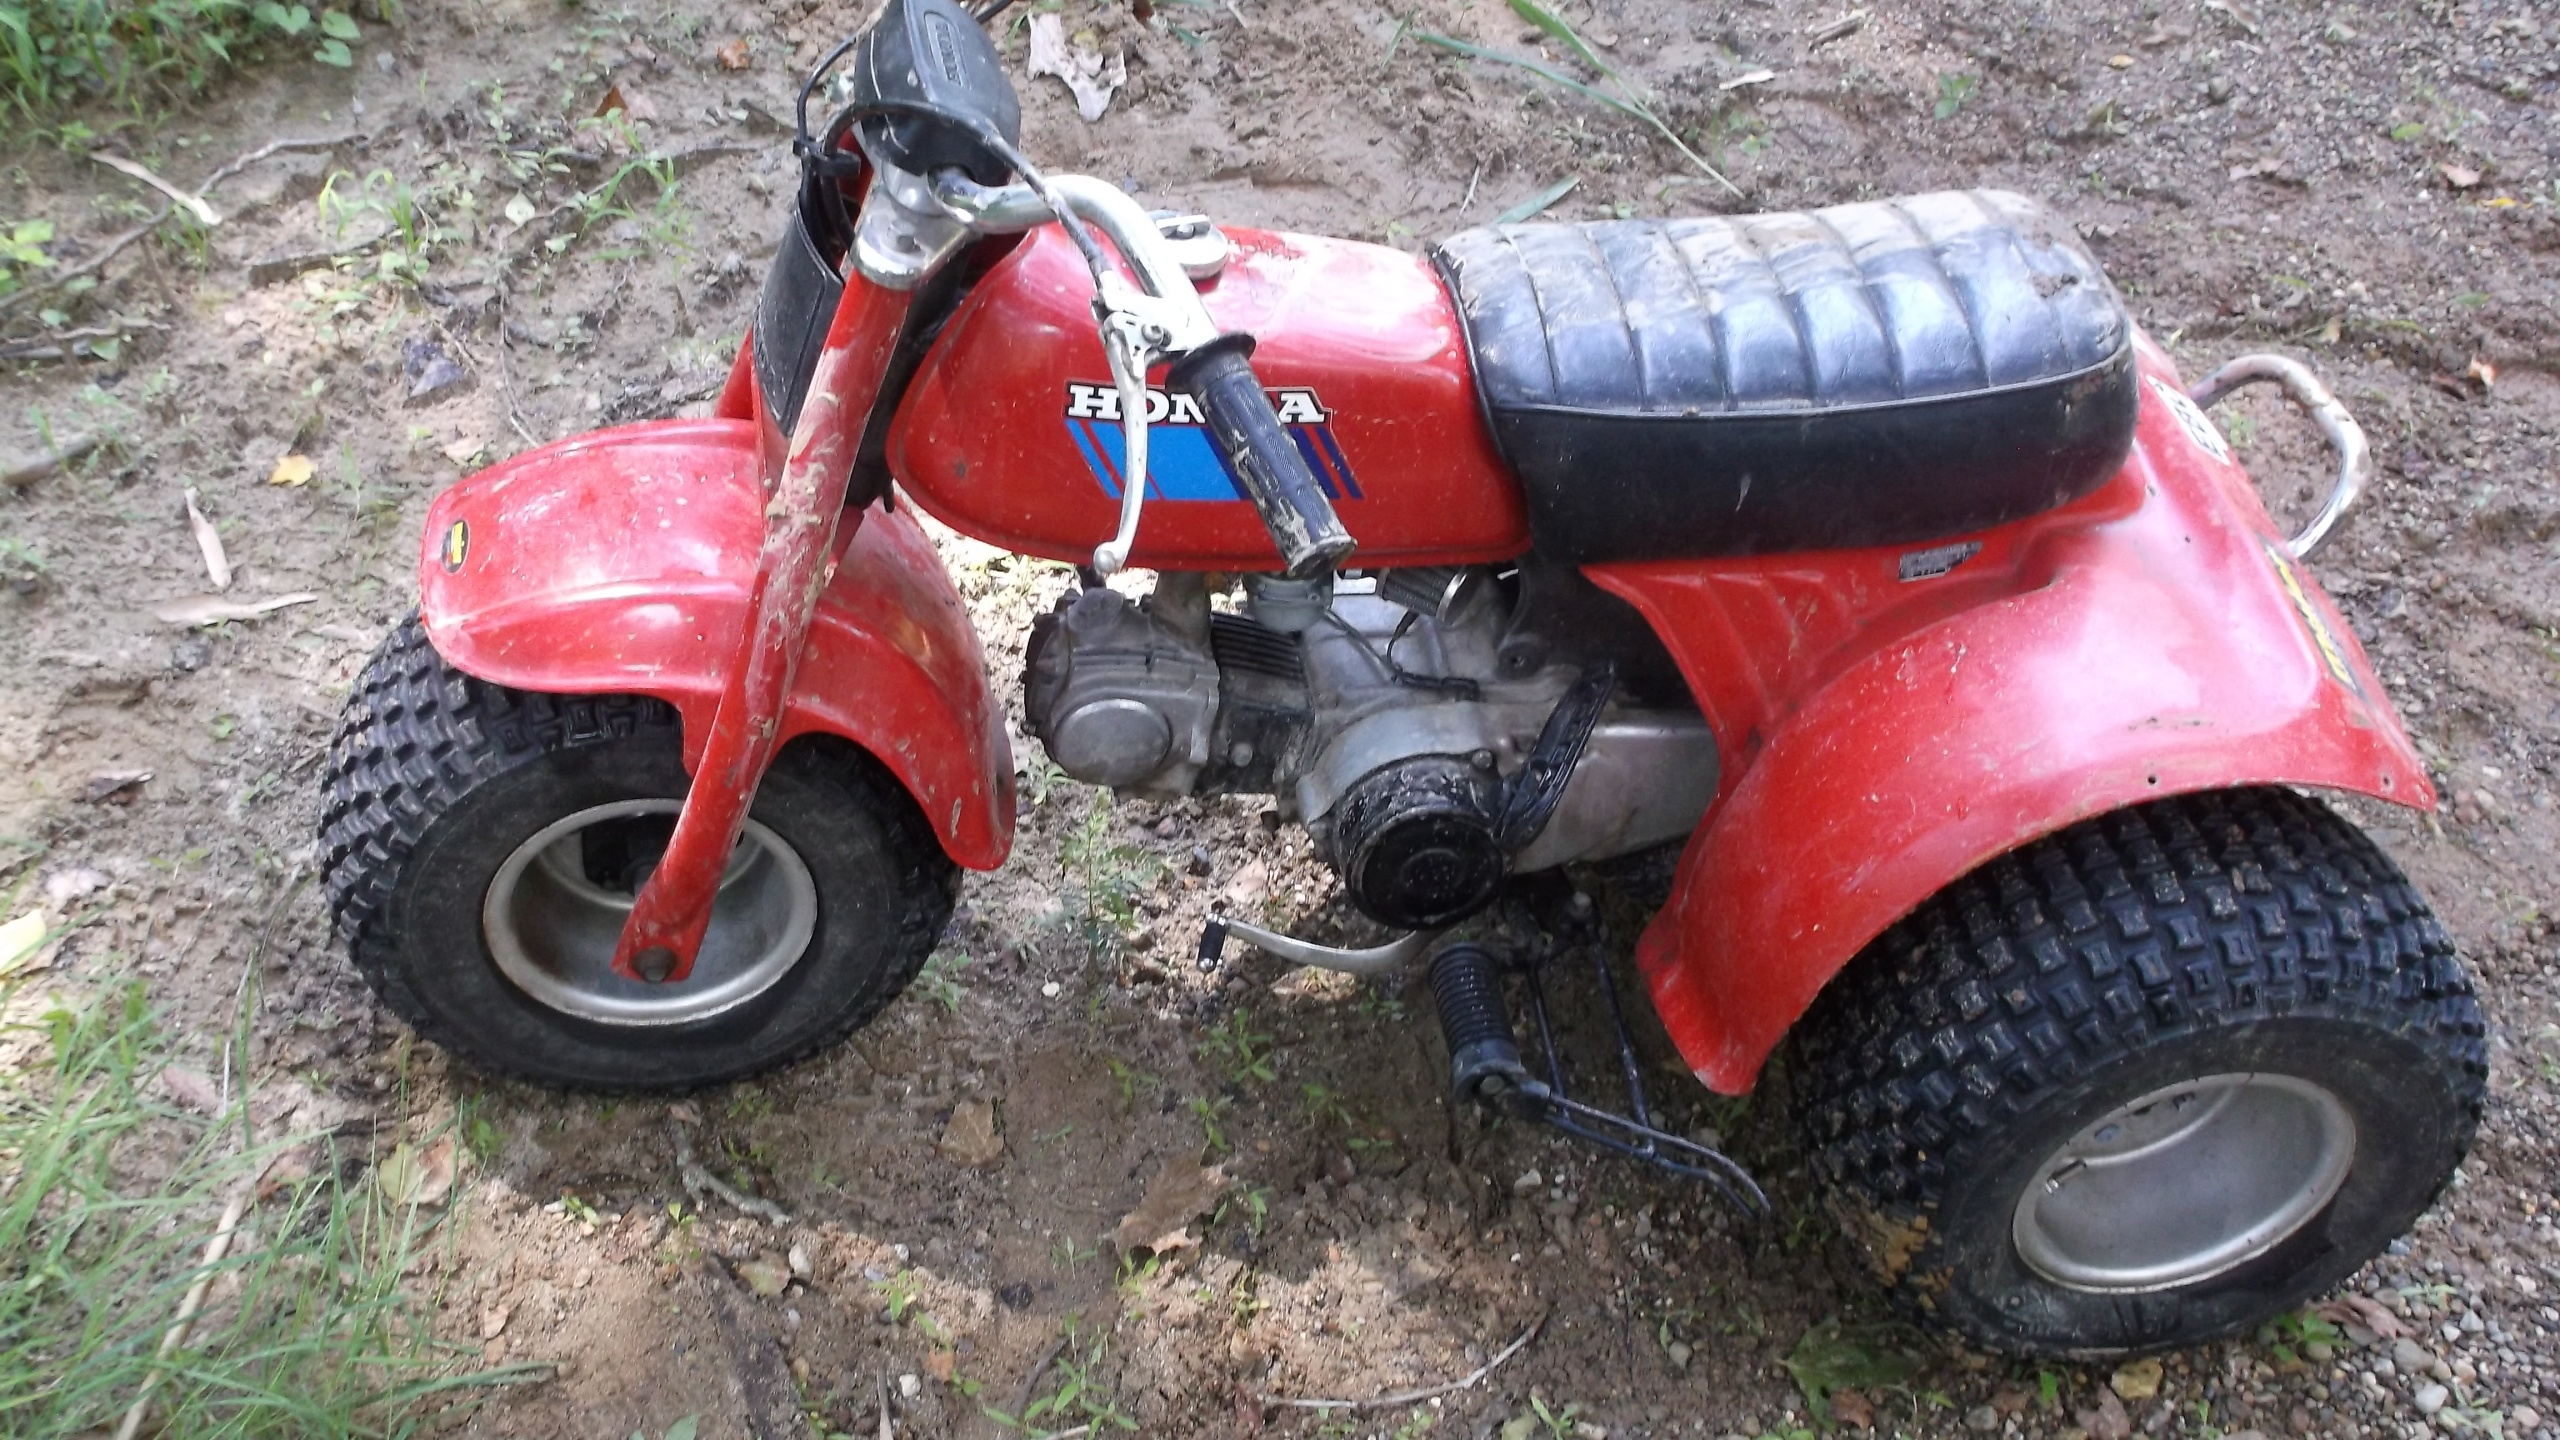 ATV CRASH 1_1499209018302.jpg